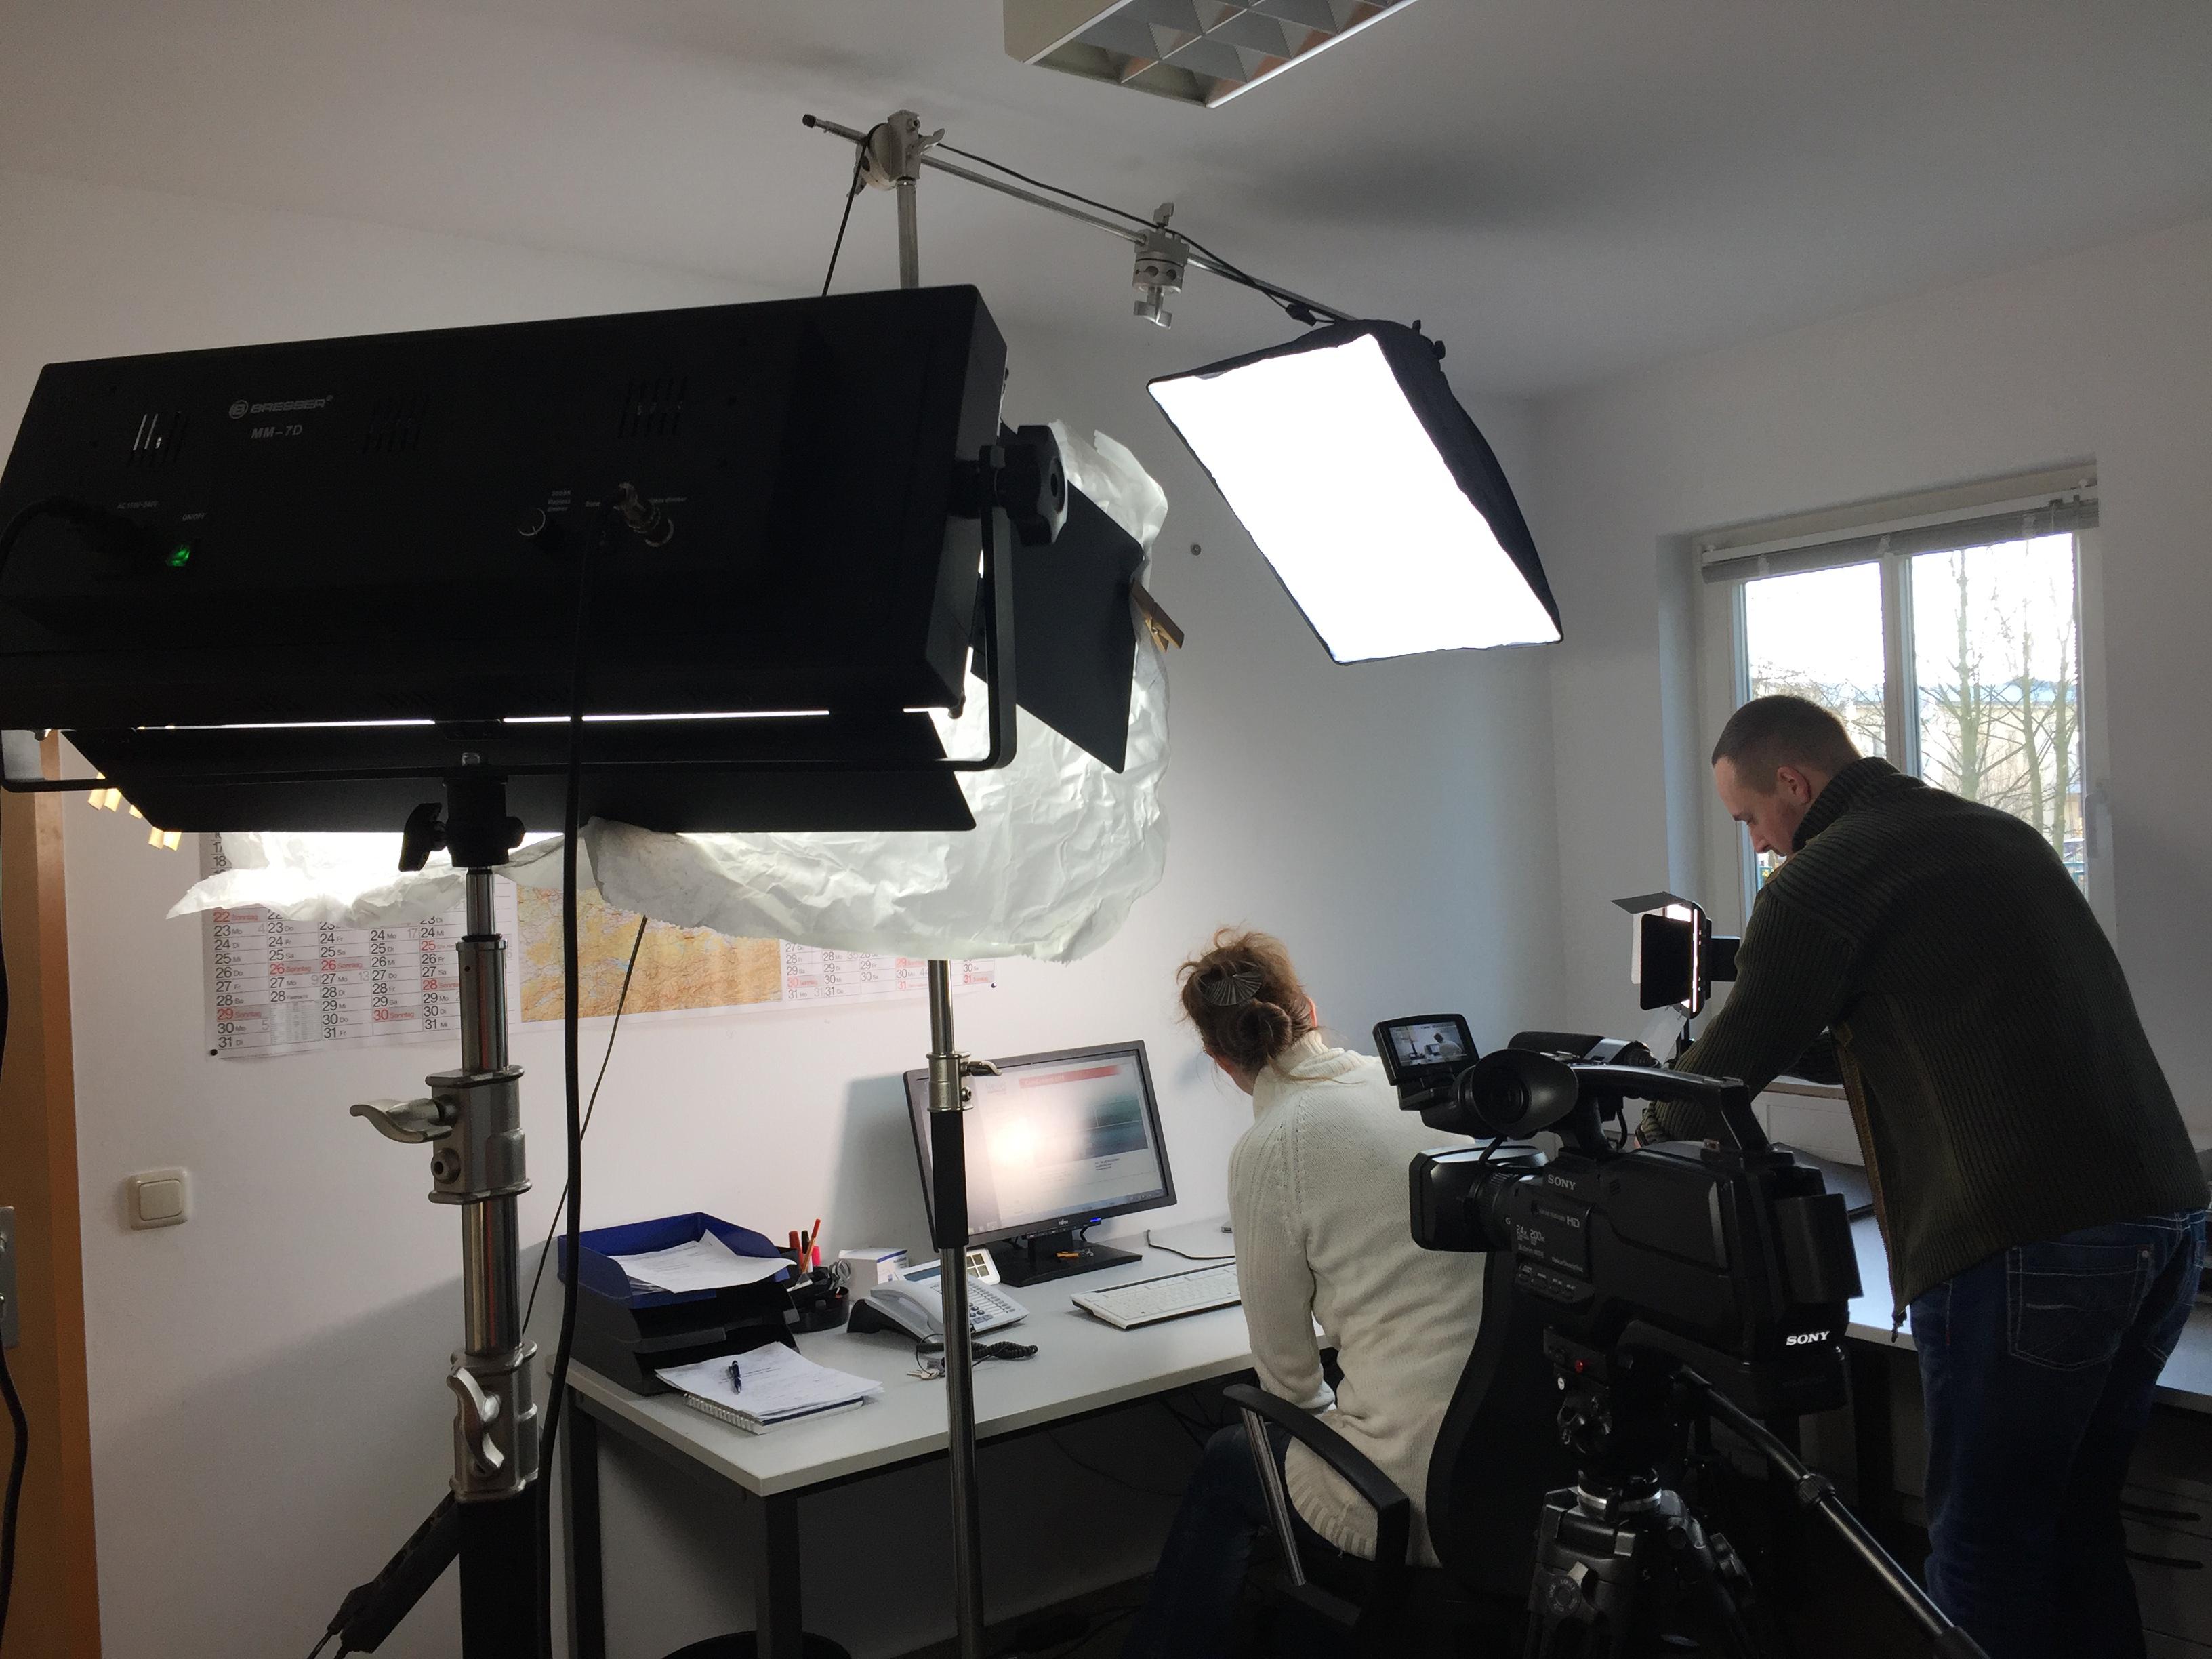 2. Büroszene für Wellner GmbH